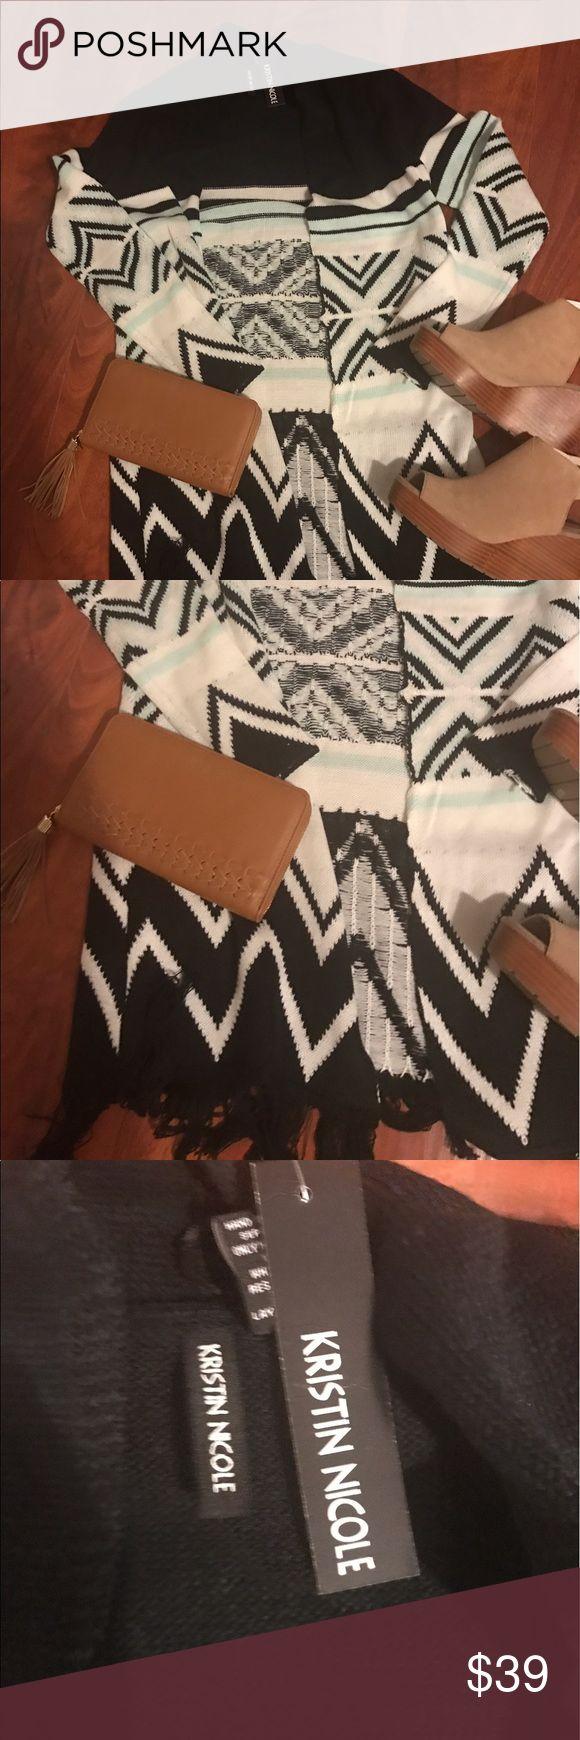 NWT Aztec Print Cardigan NWT Black, White and Mint Aztec Print Cardigan with Fringe Bottom Sweaters Cardigans